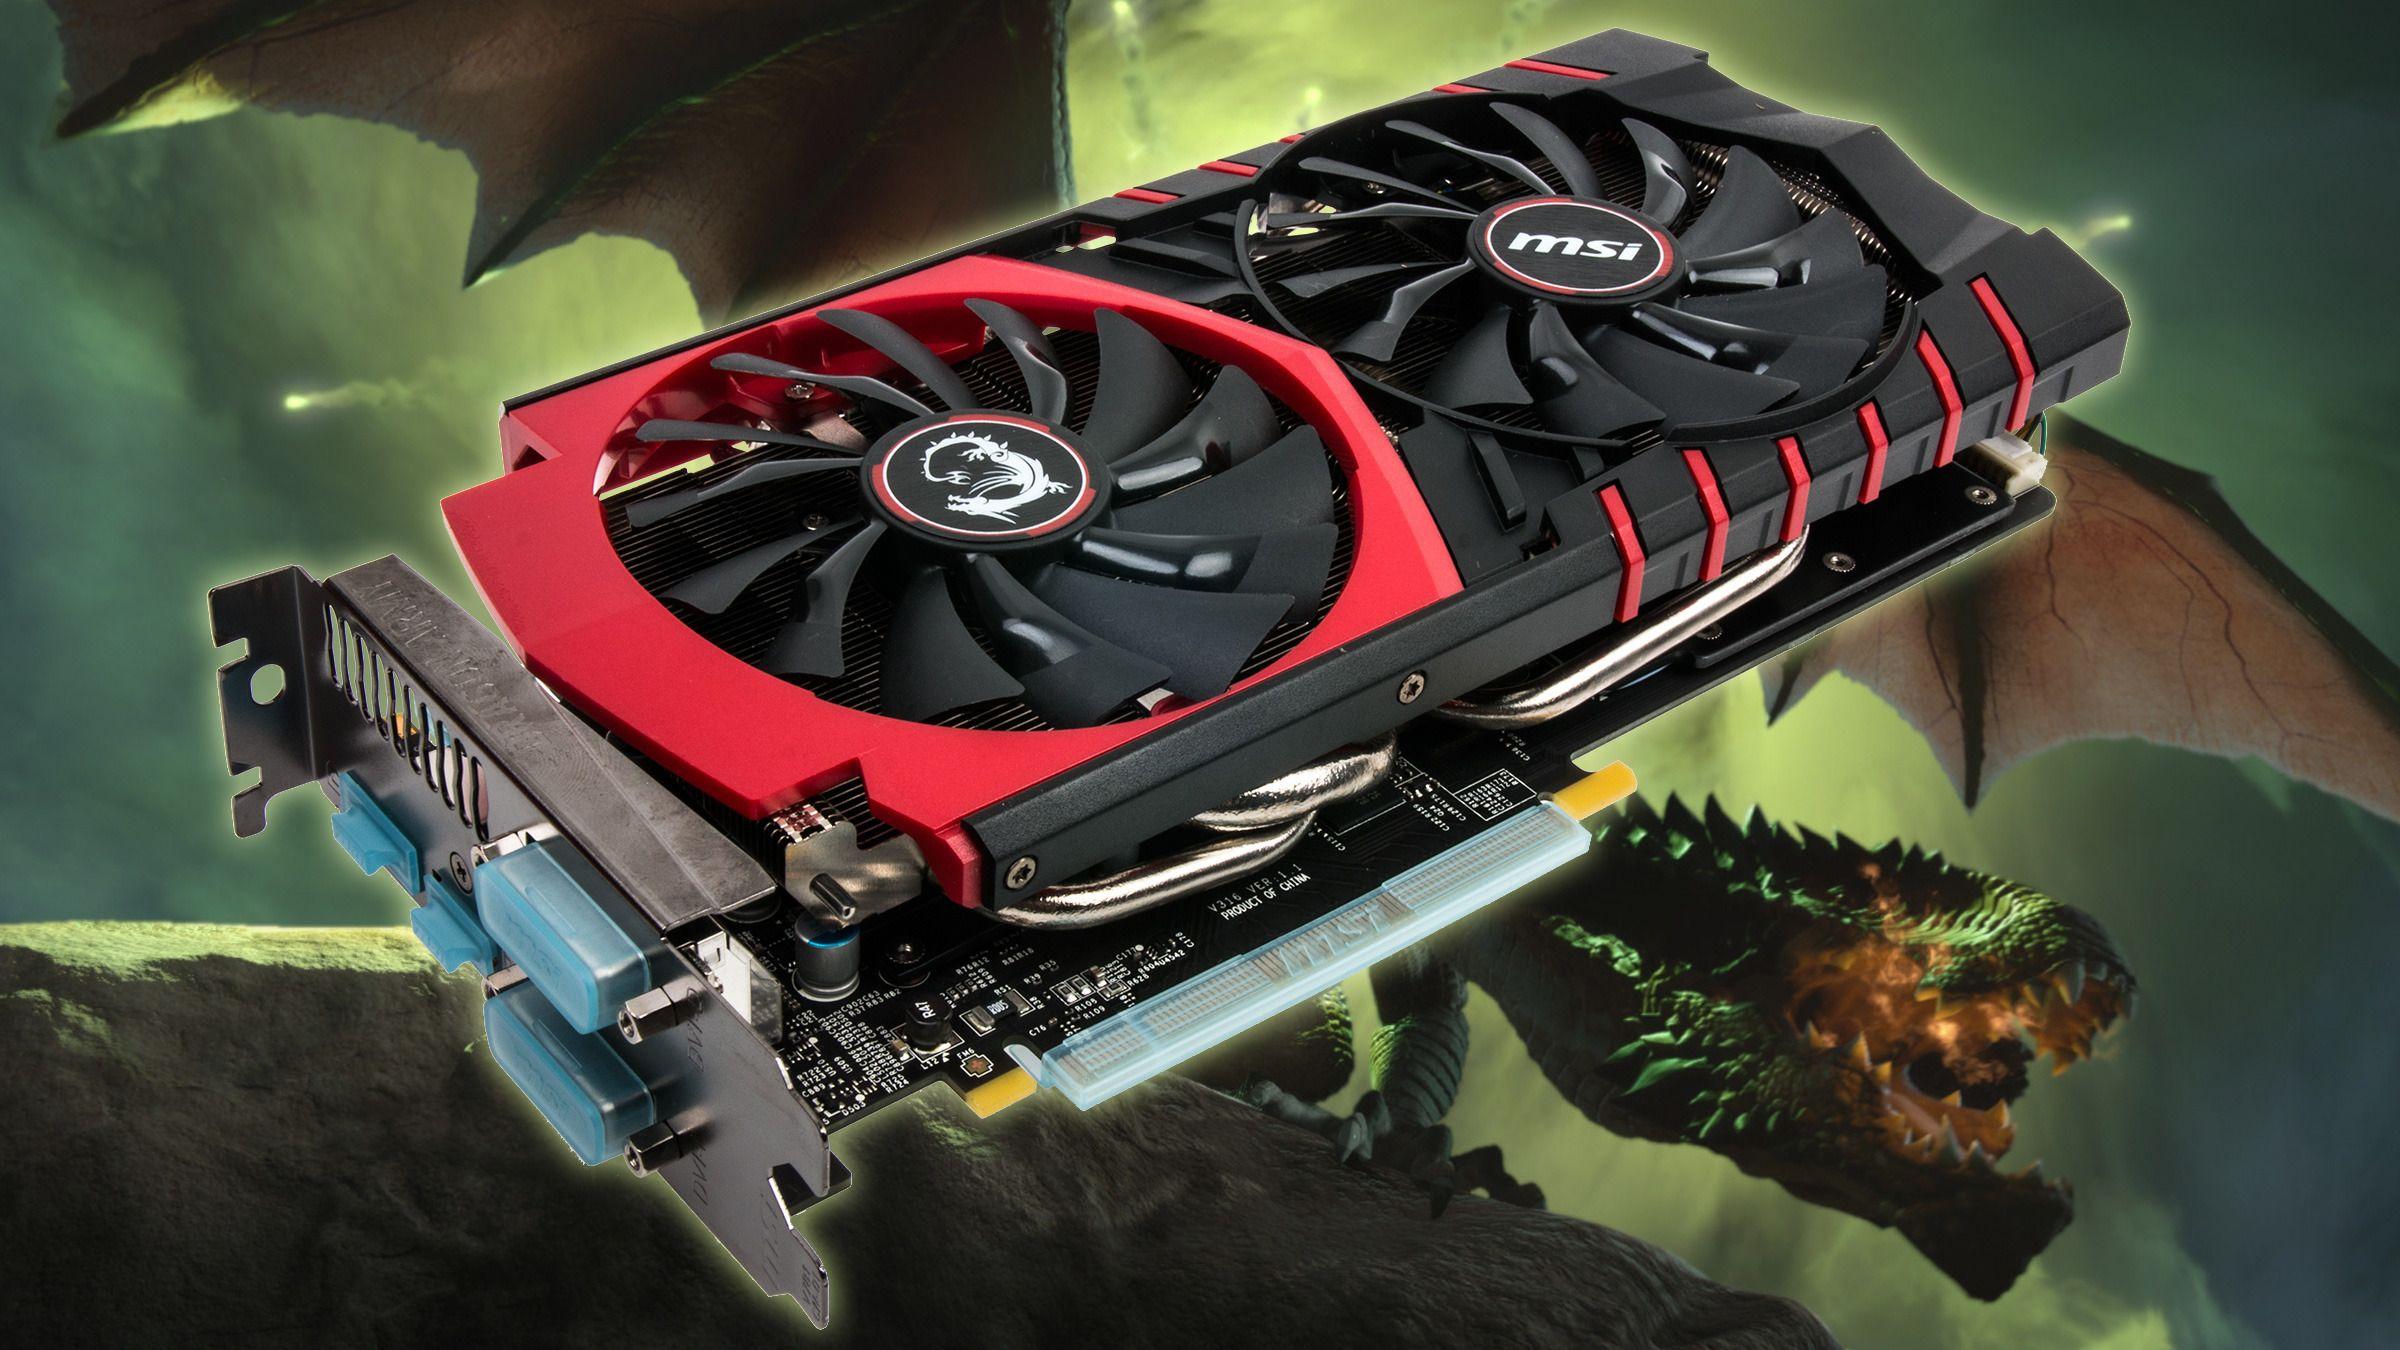 MSI GeForce GTX 970 Gaming 4G Twin Frozr V. Foto: Varg Aamo, Tek.no / EA (bakgrunn)